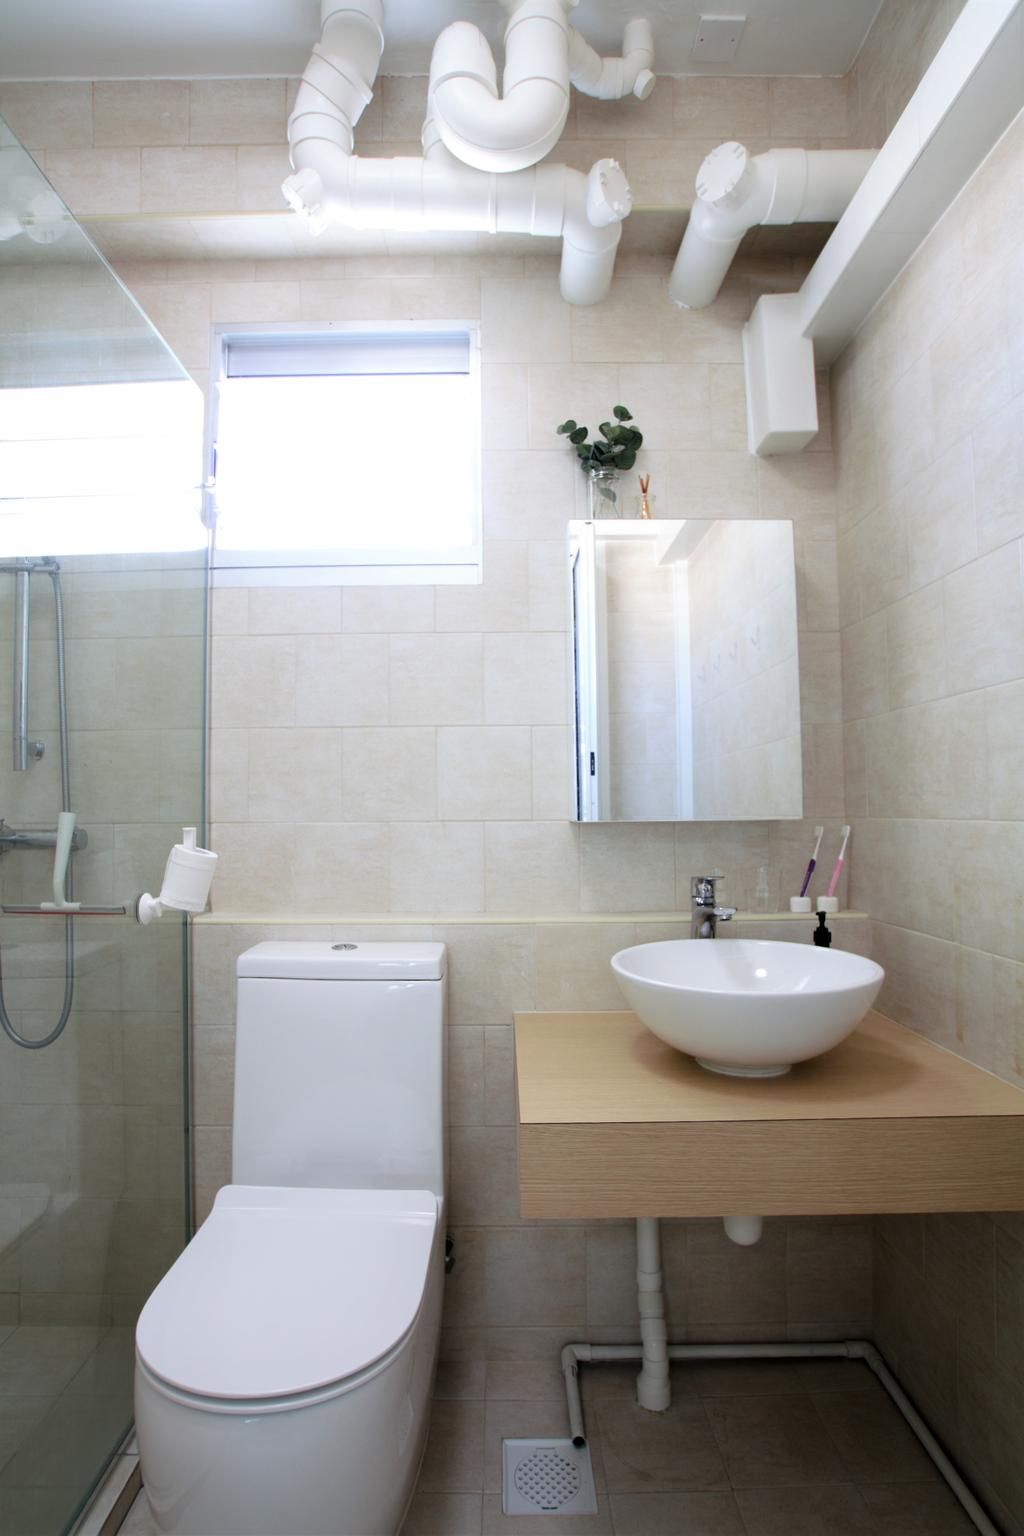 HDB, Telok Blangah, Interior Designer, Intrigue-d Design Consultancy, Appliance, Electrical Device, Washer, Bathroom, Indoors, Interior Design, Room